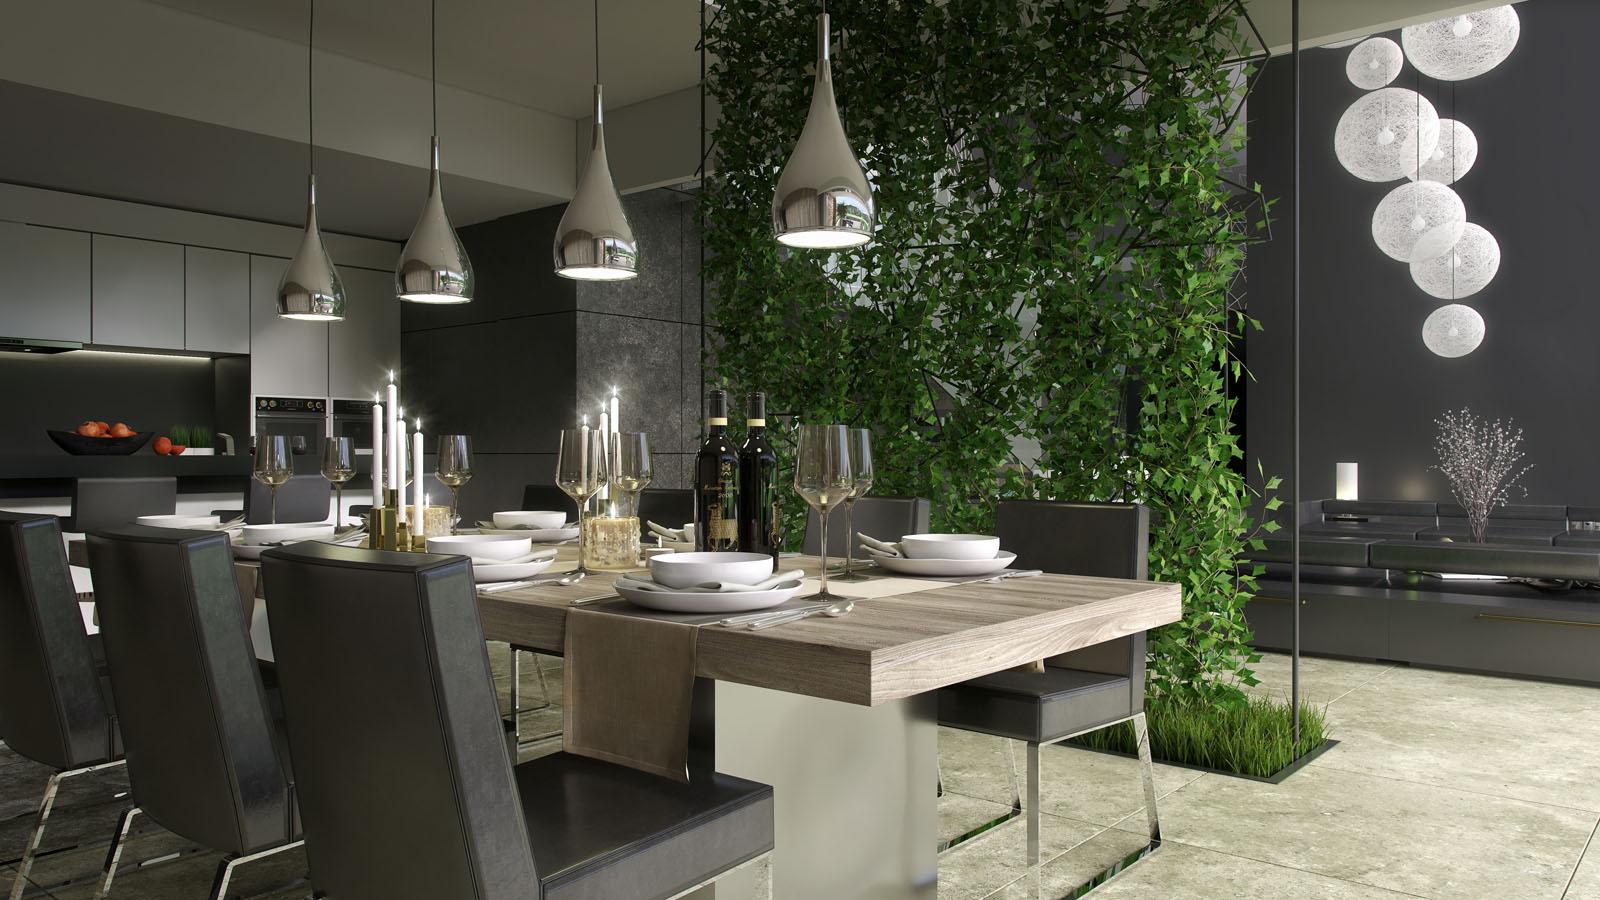 3d interieur ontwerpvisualisatie luxe woning choro for 3d interieur ontwerp